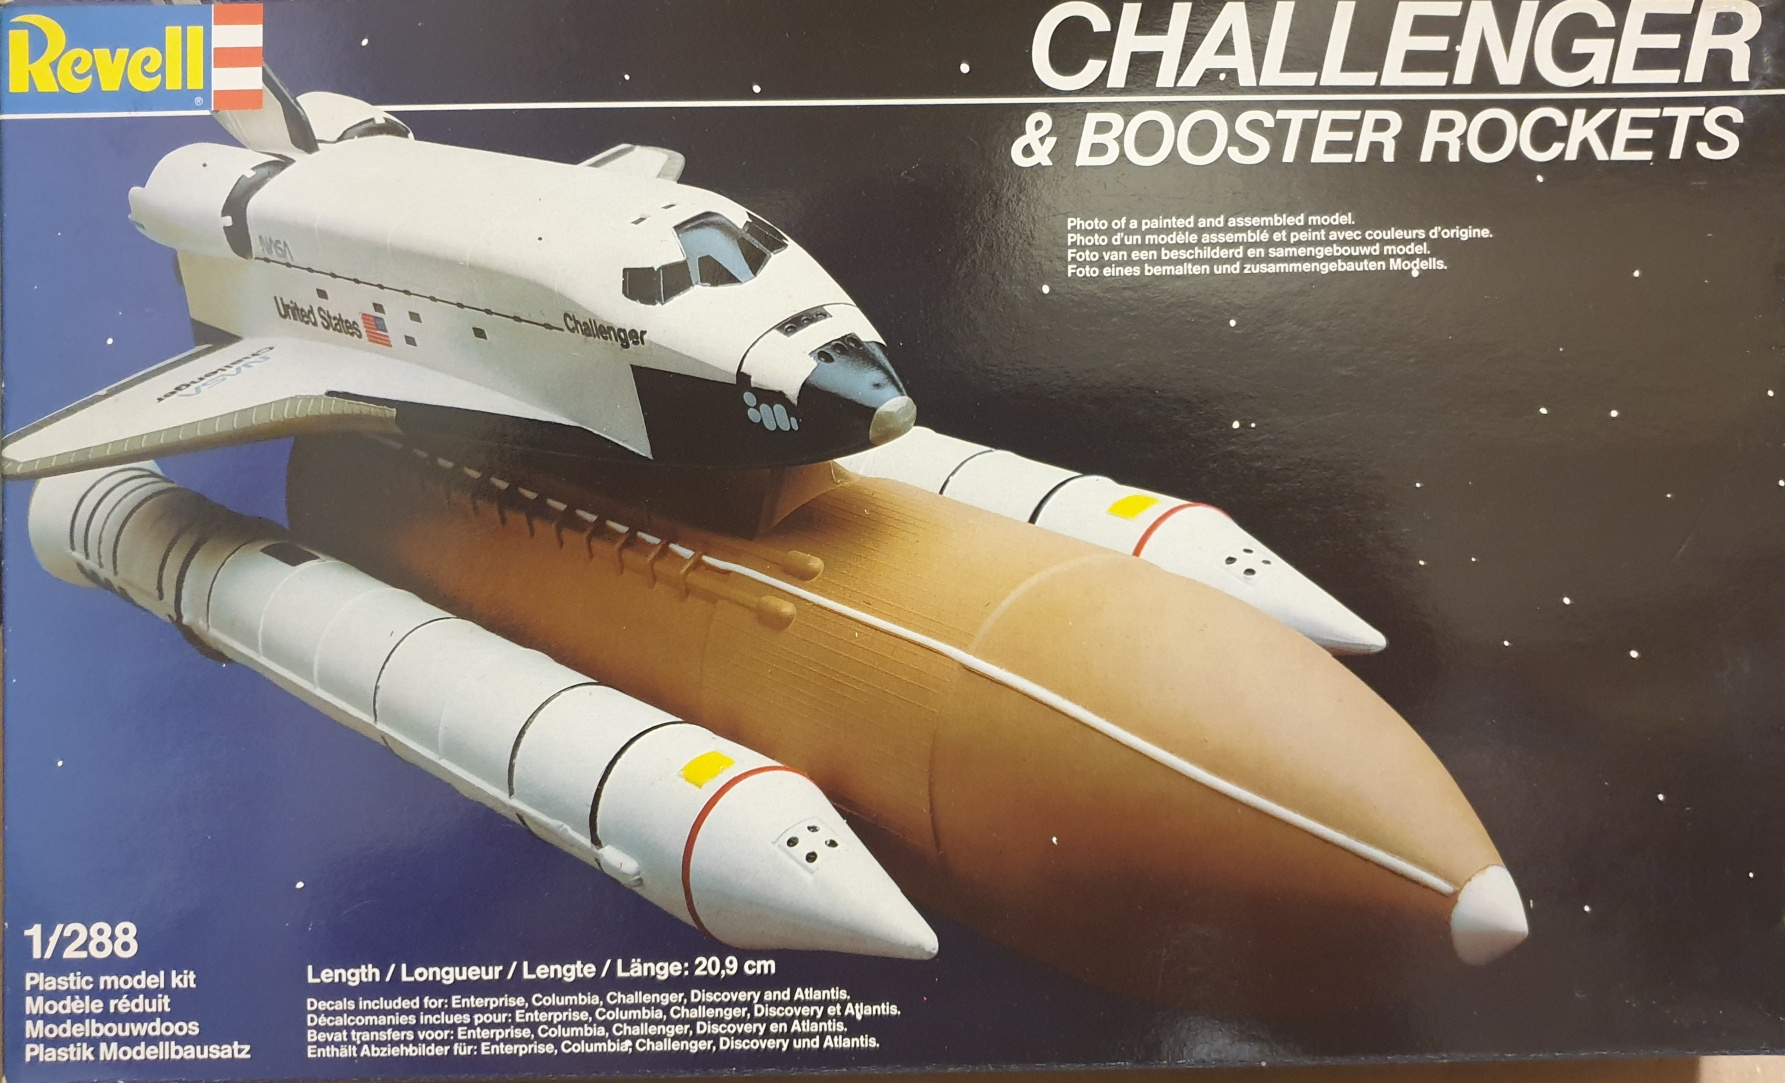 Revell 4528 Challenger & Booster Rockets